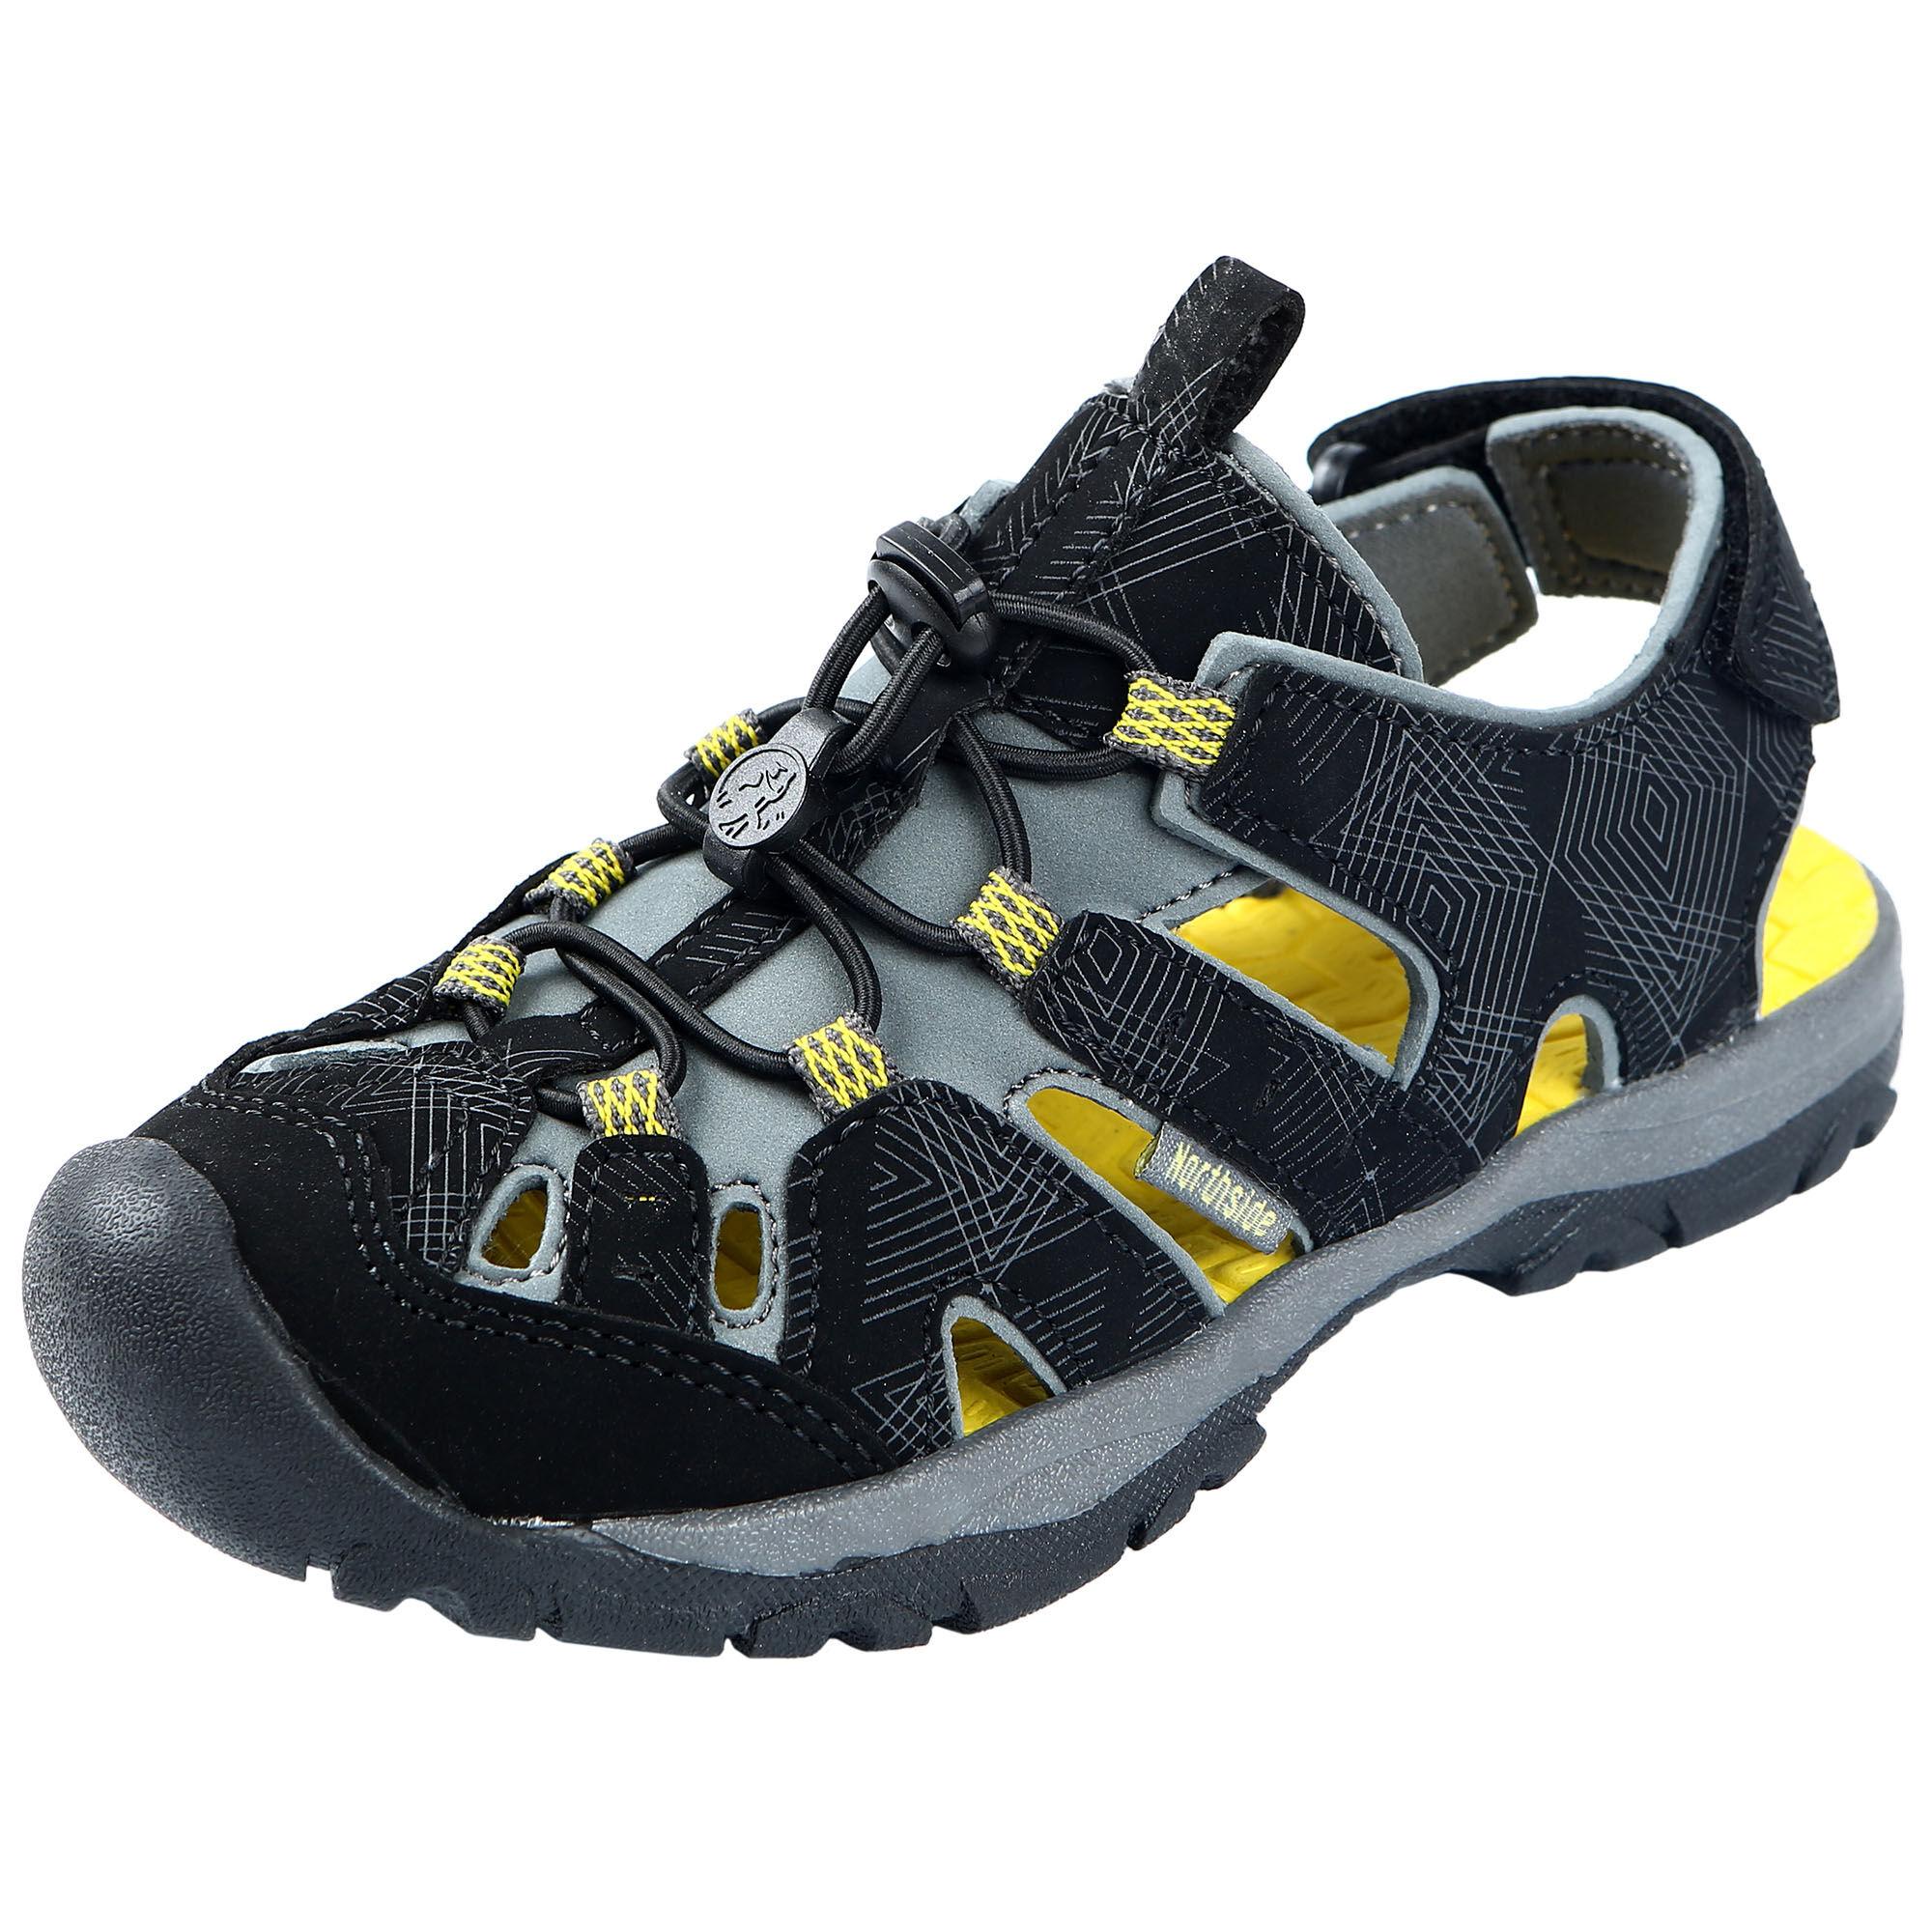 Northside Boy's Burke SE Sport Sandals  - Black/Yellow - Size: 3